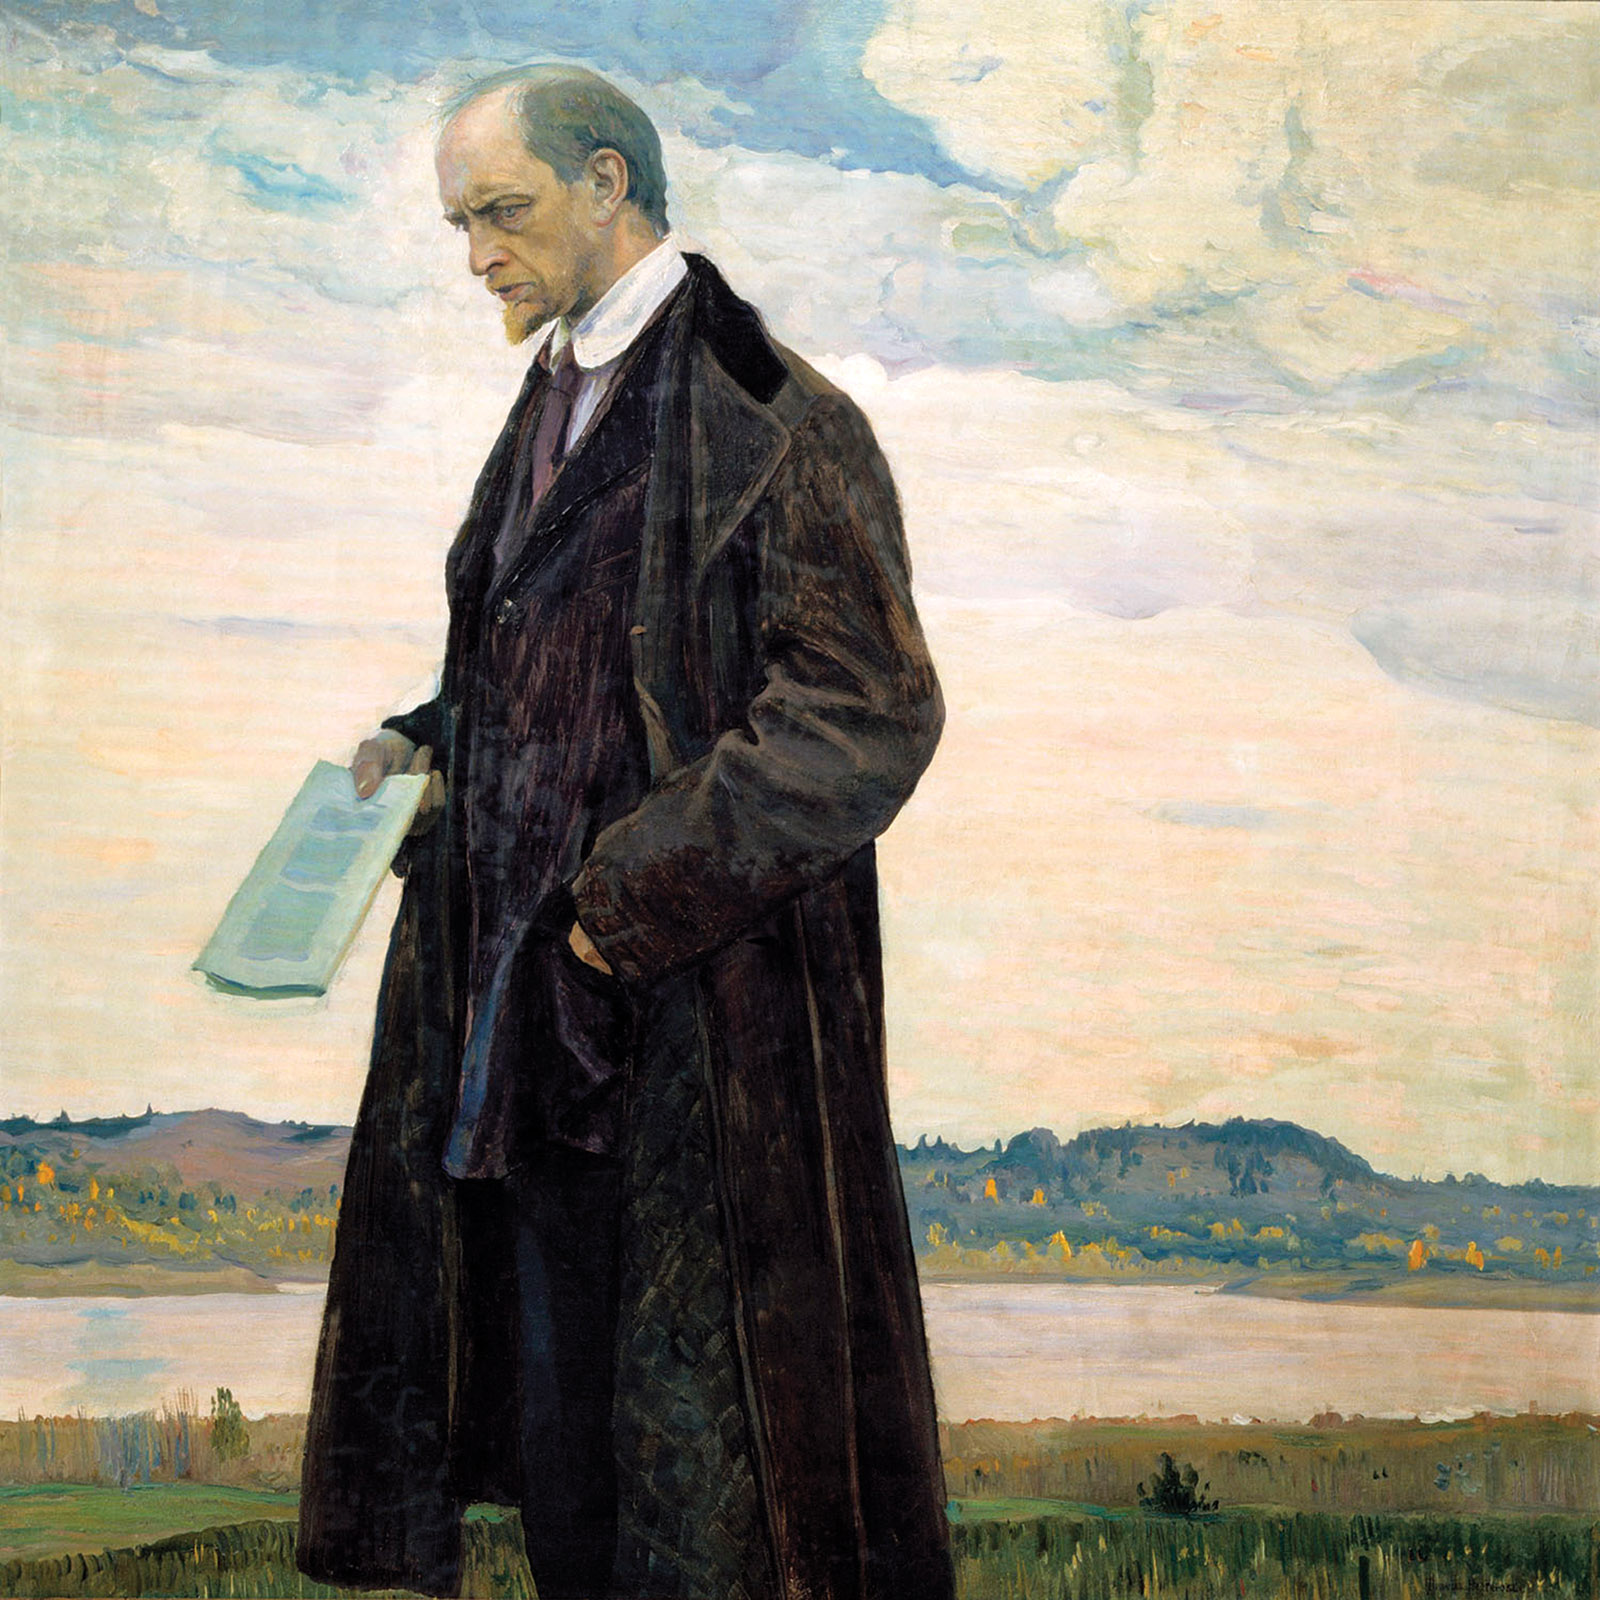 Mikhail Nesterov: The Thinker (Portrait of Ivan Ilyin), 1921